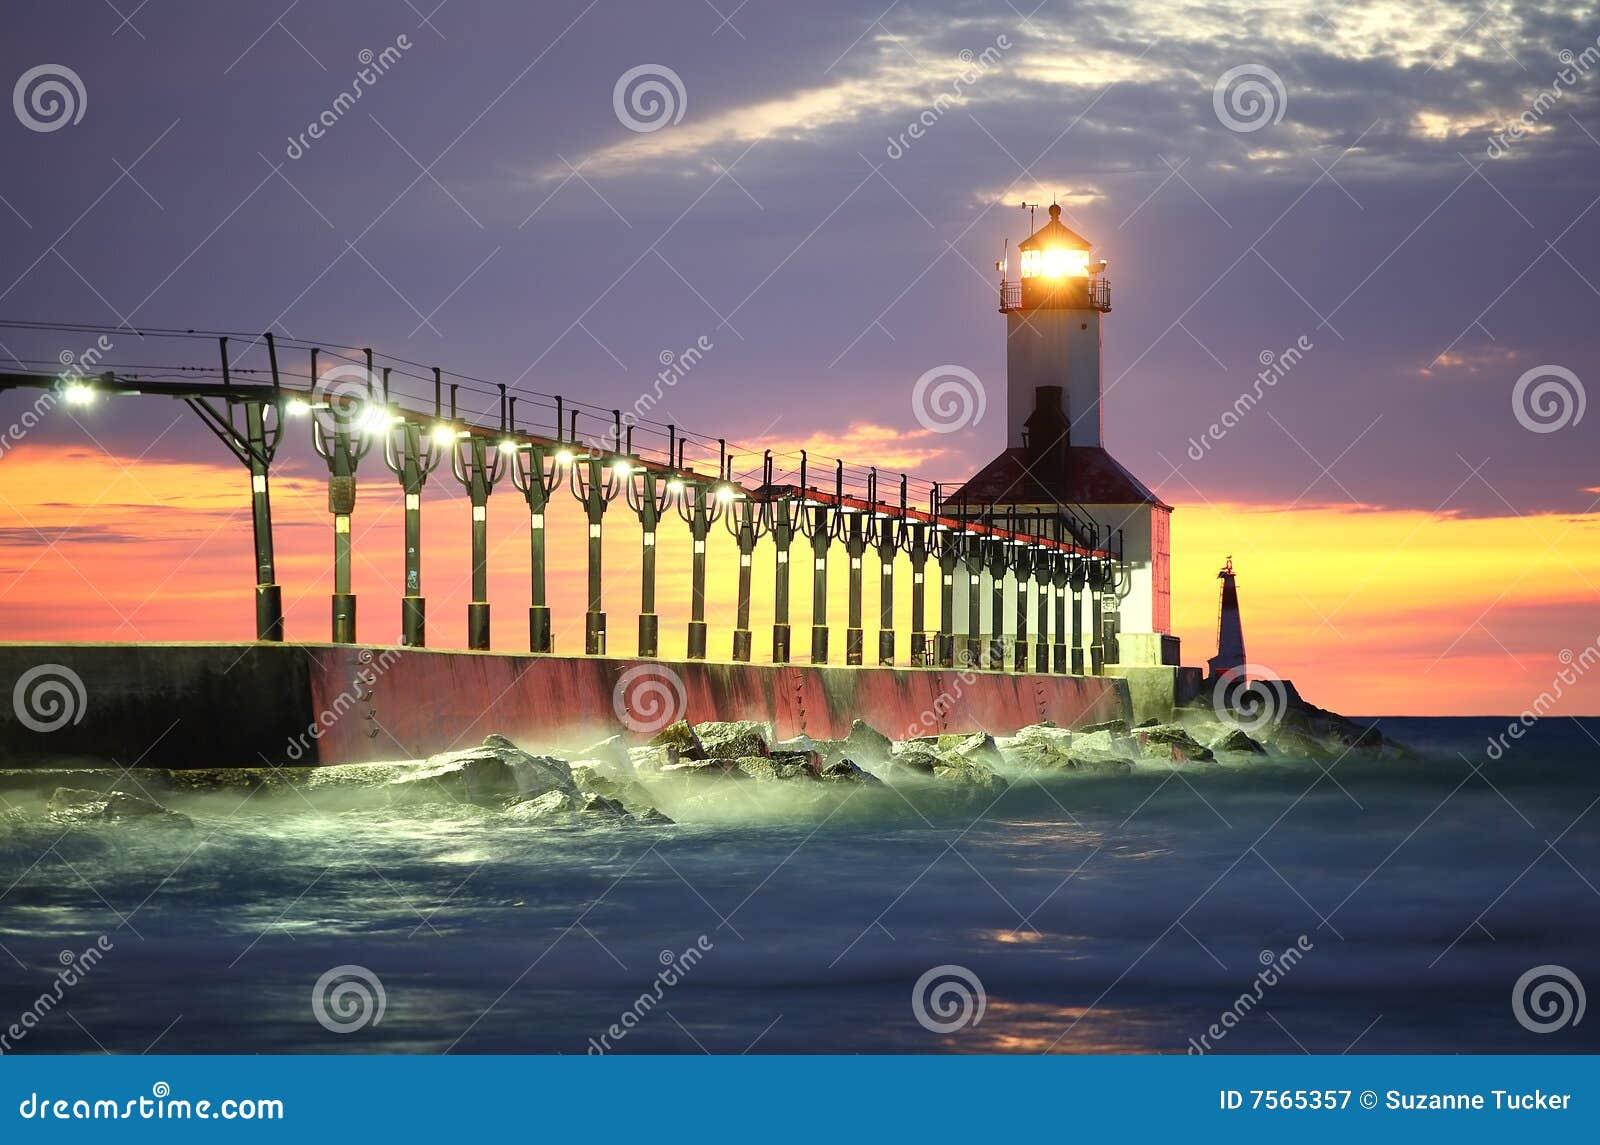 Michigan City Lighthouse, Michigan City, Indiana